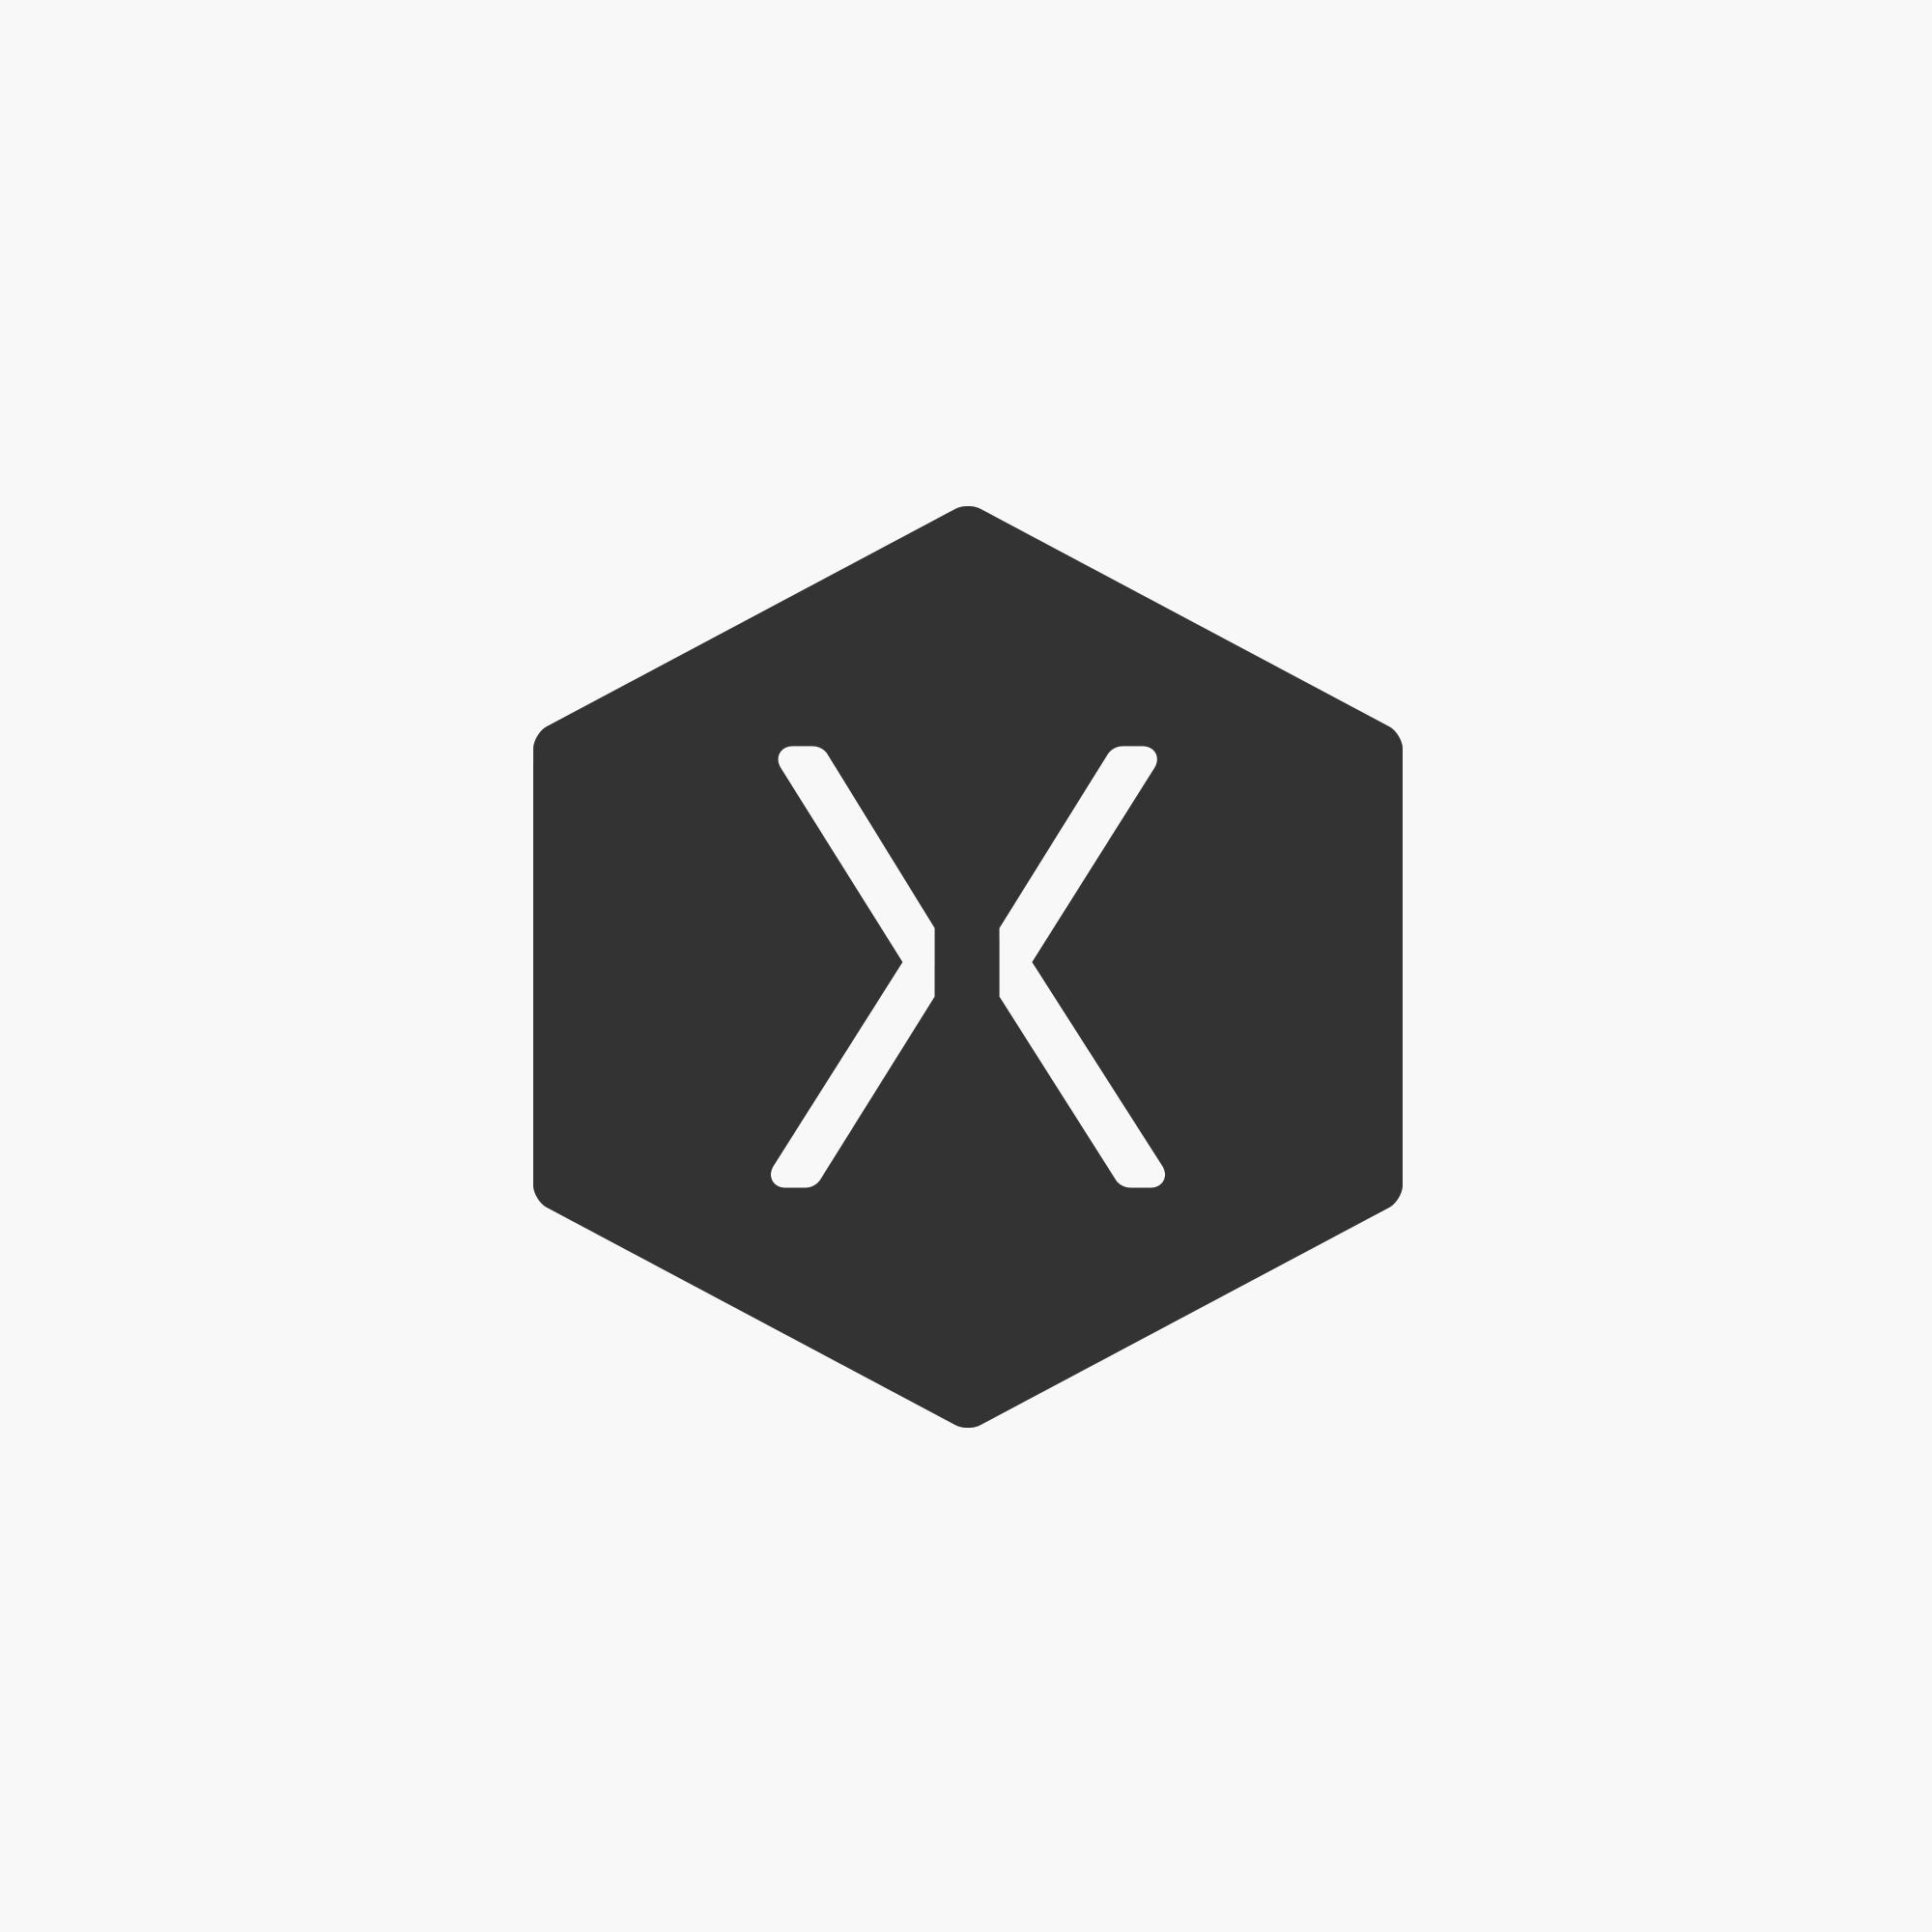 Logos_HexagonEnergyMark@2x.png